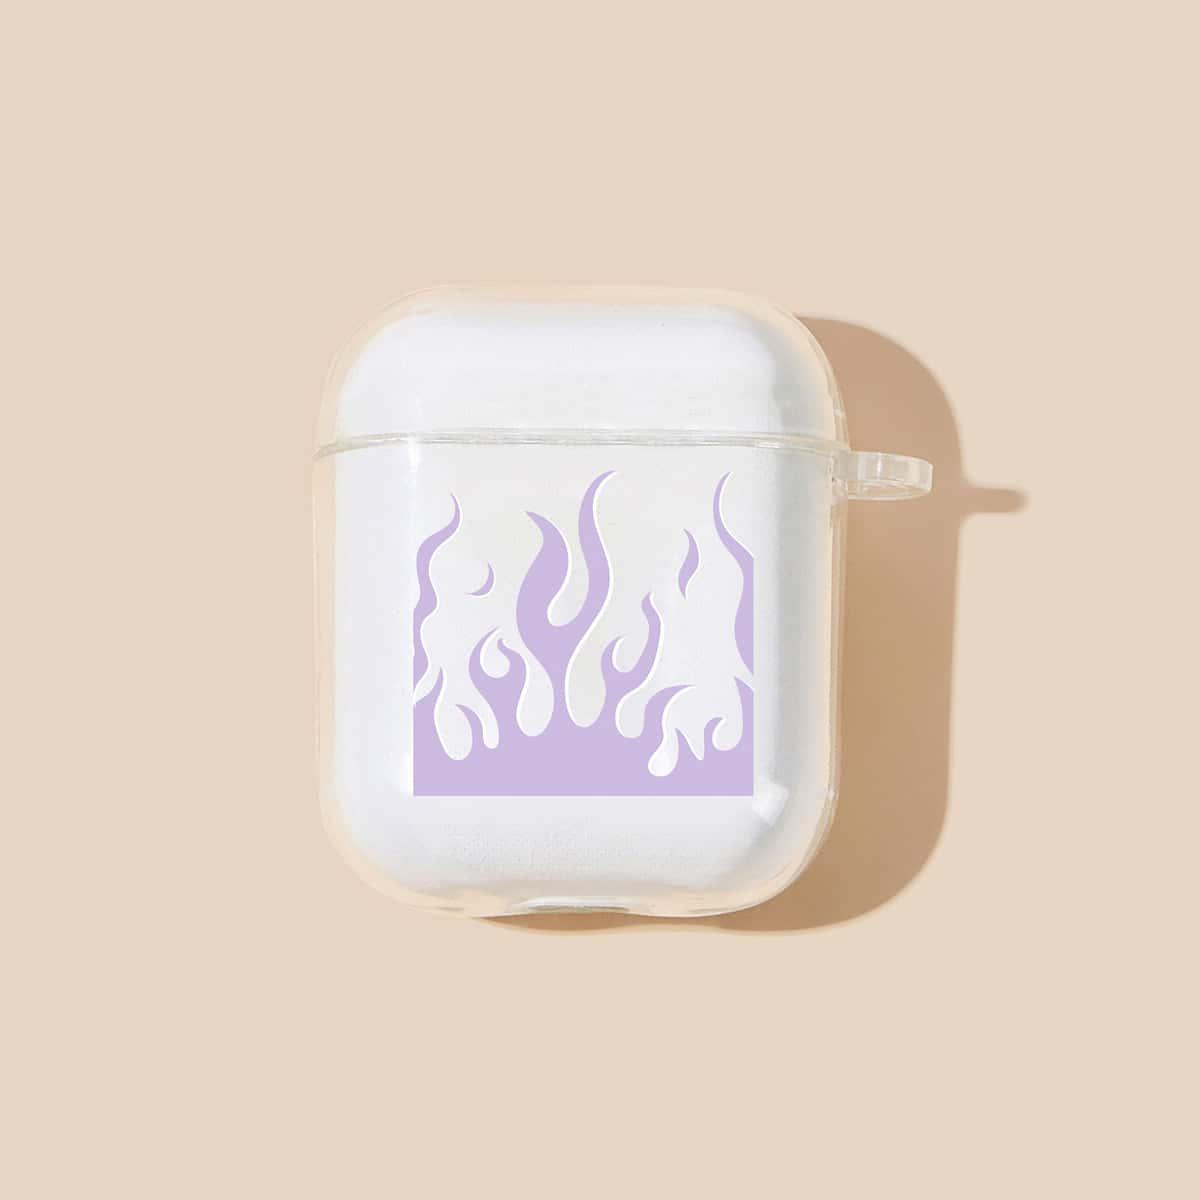 SHEIN / Transparente Airpods Hülle mit Feuer Muster